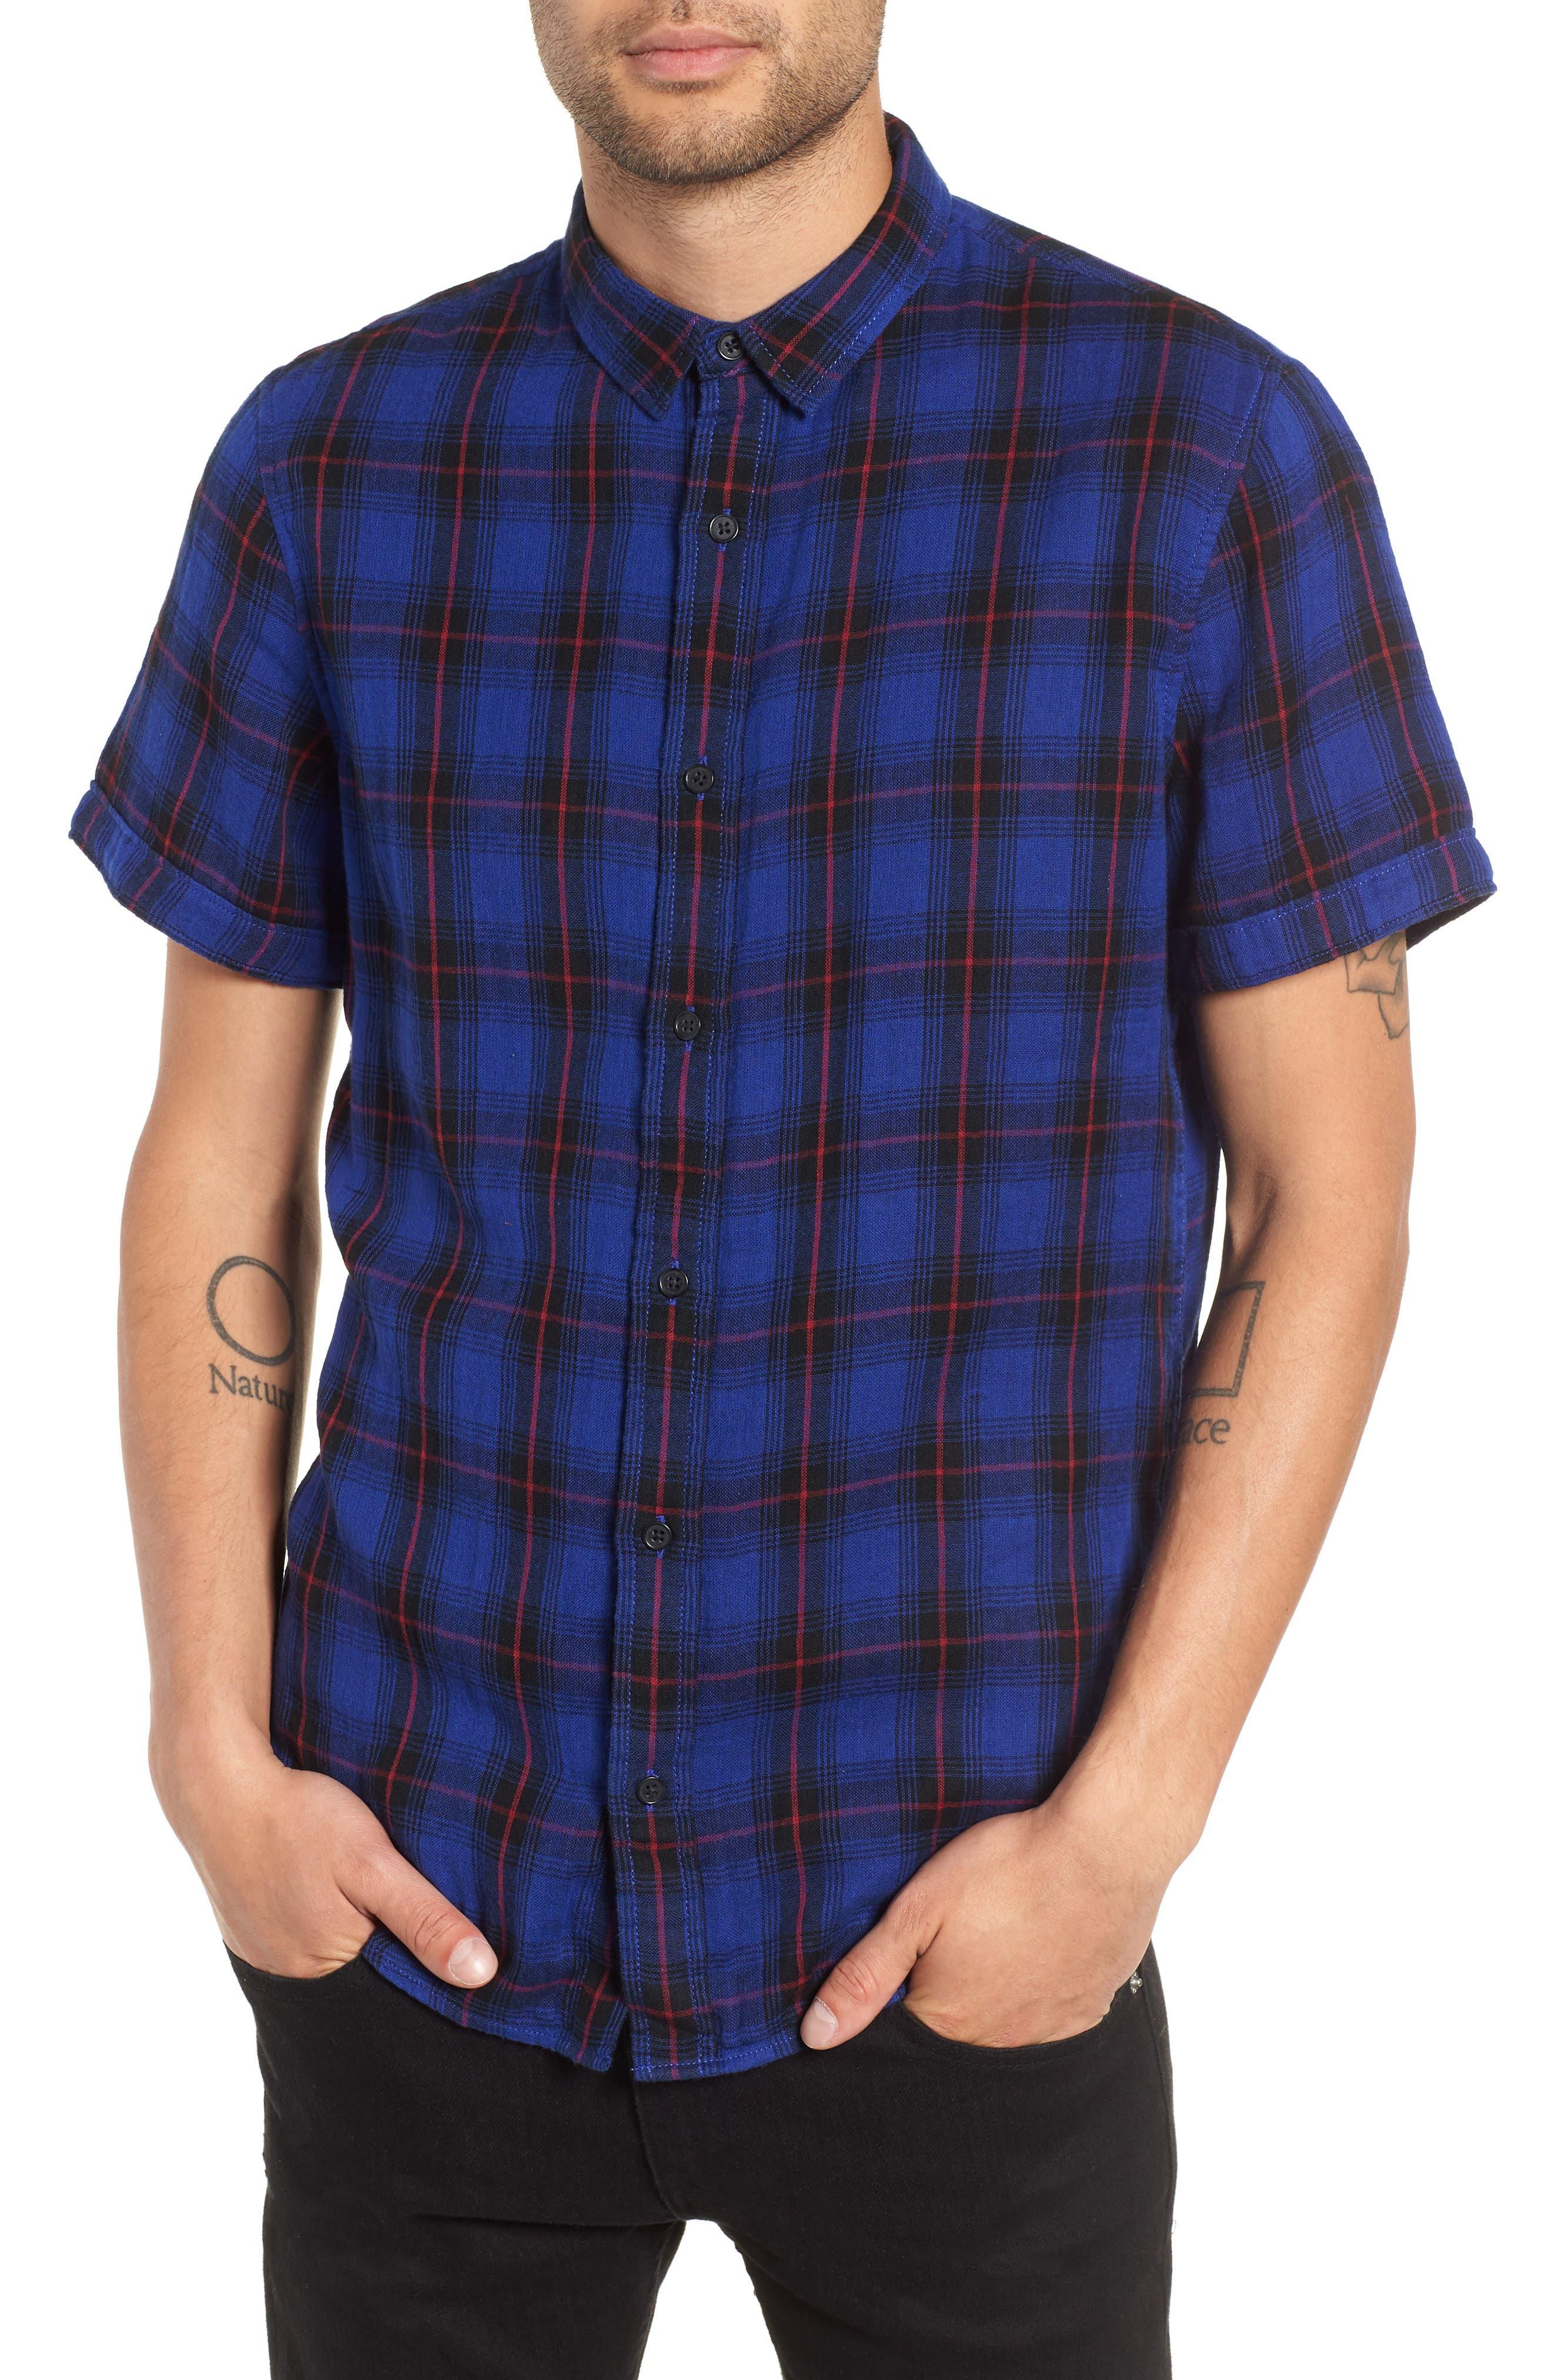 Plaid Woven Shirt,                         Main,                         color, BLUE BLACK LUCA PLAID